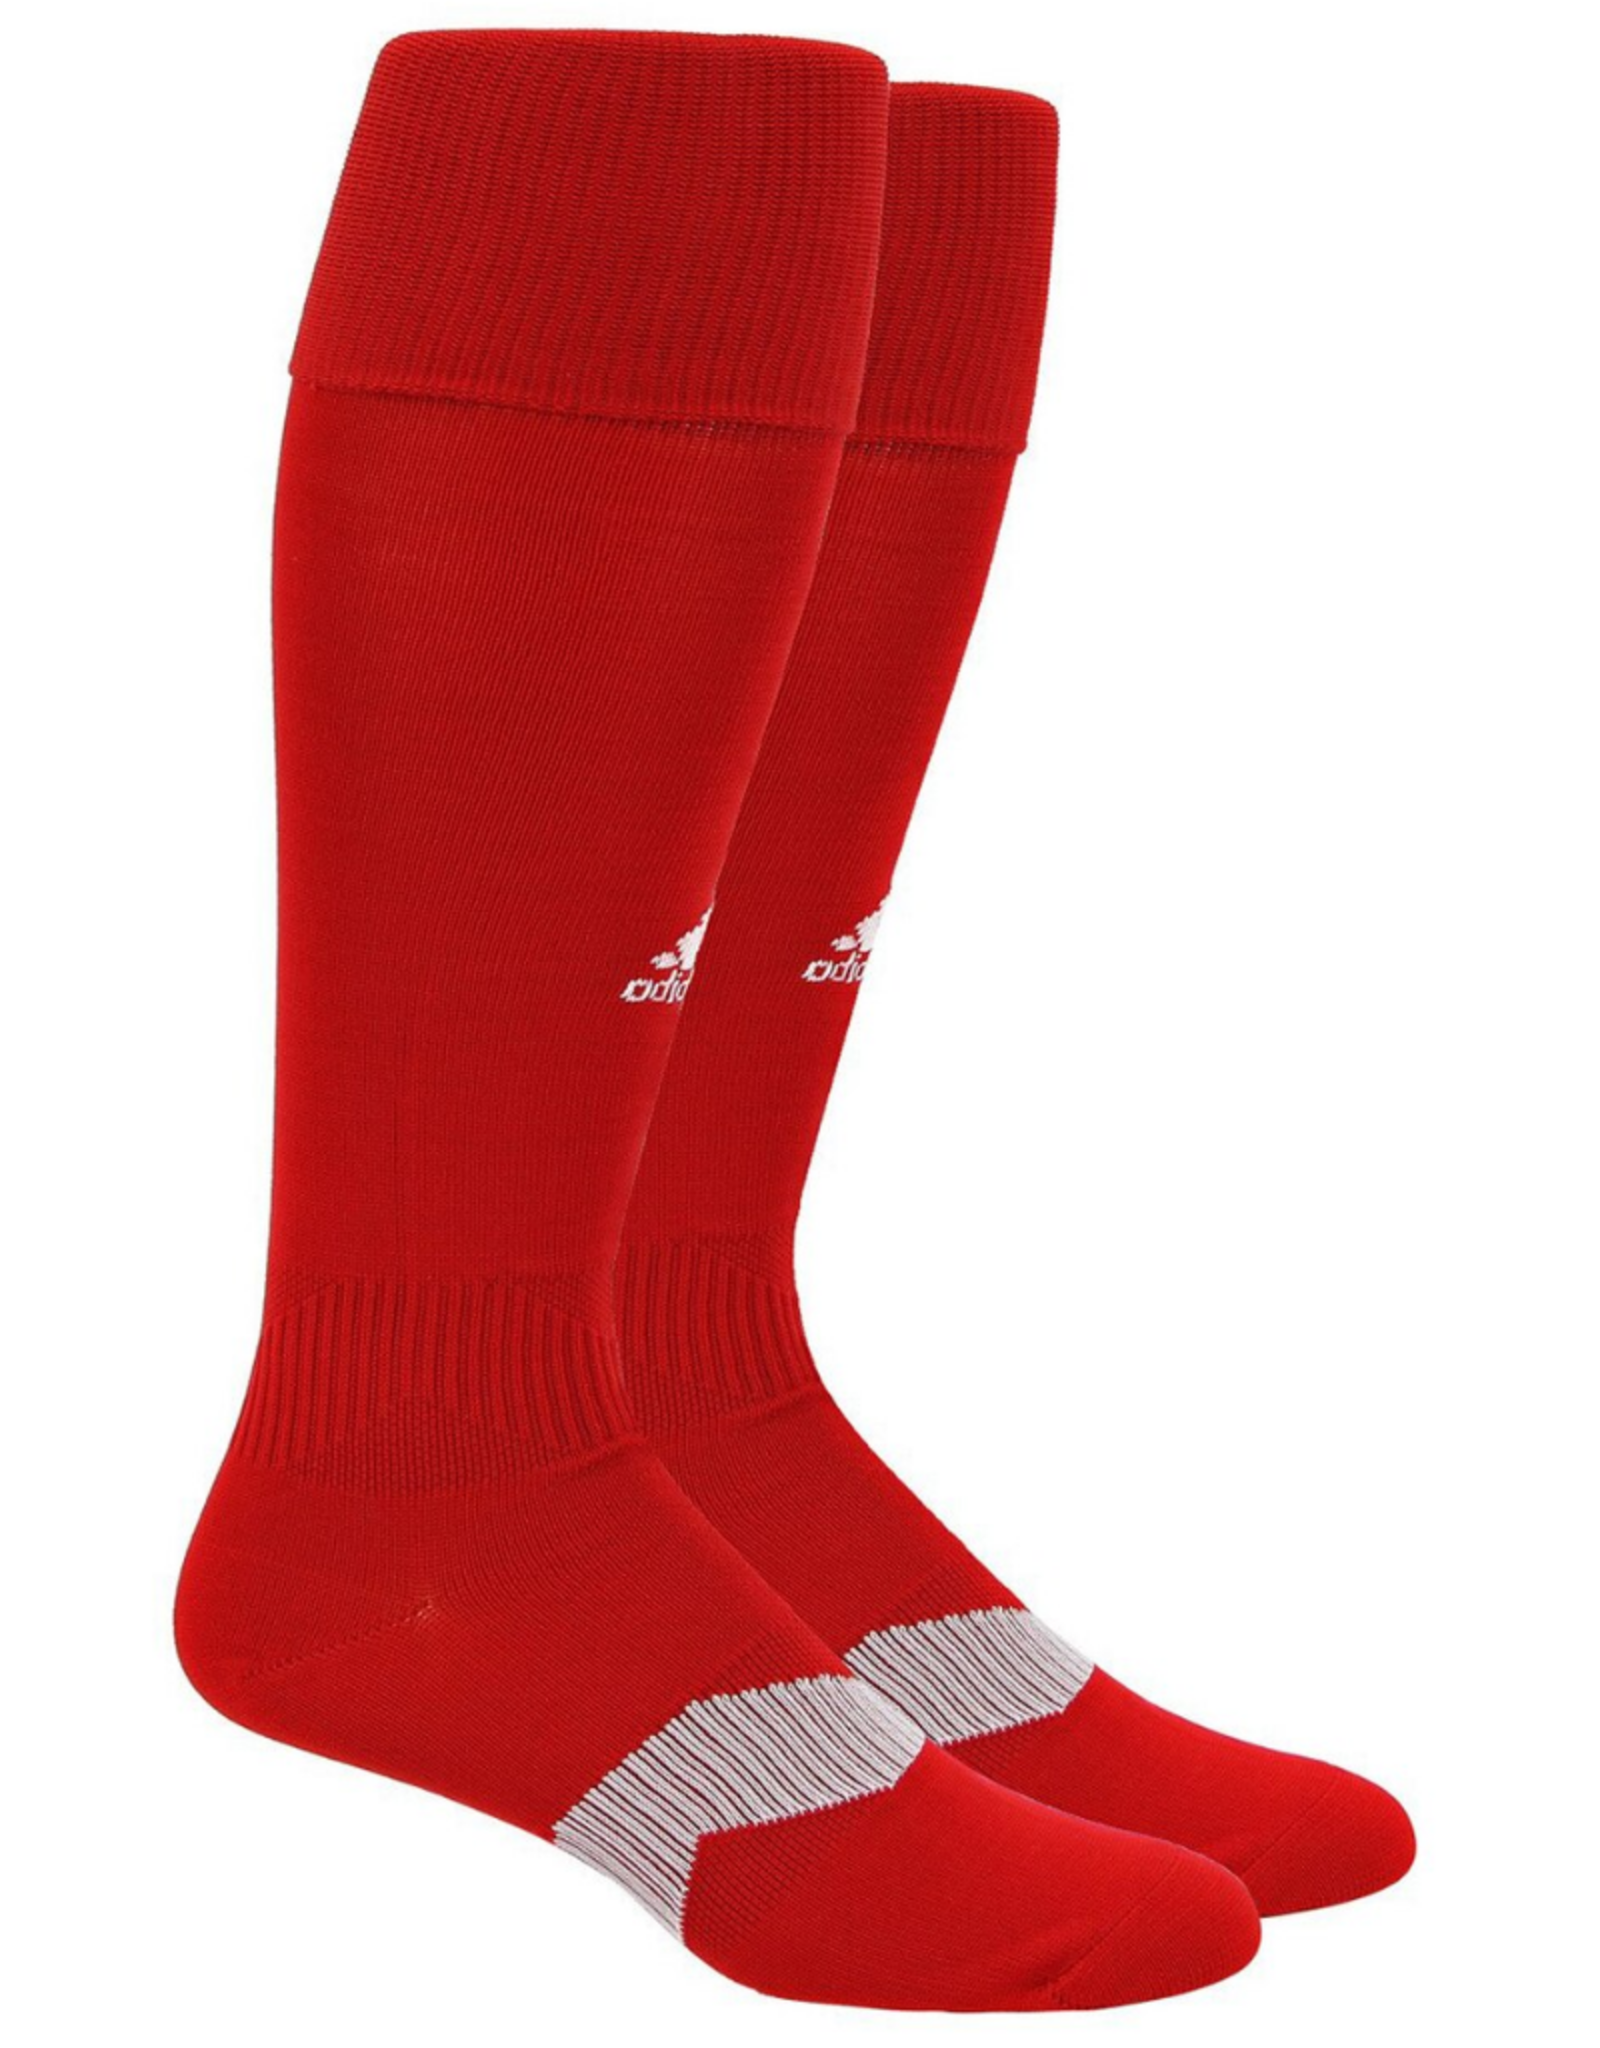 Adidas Adidas '21 Metro Soccer Sock Red